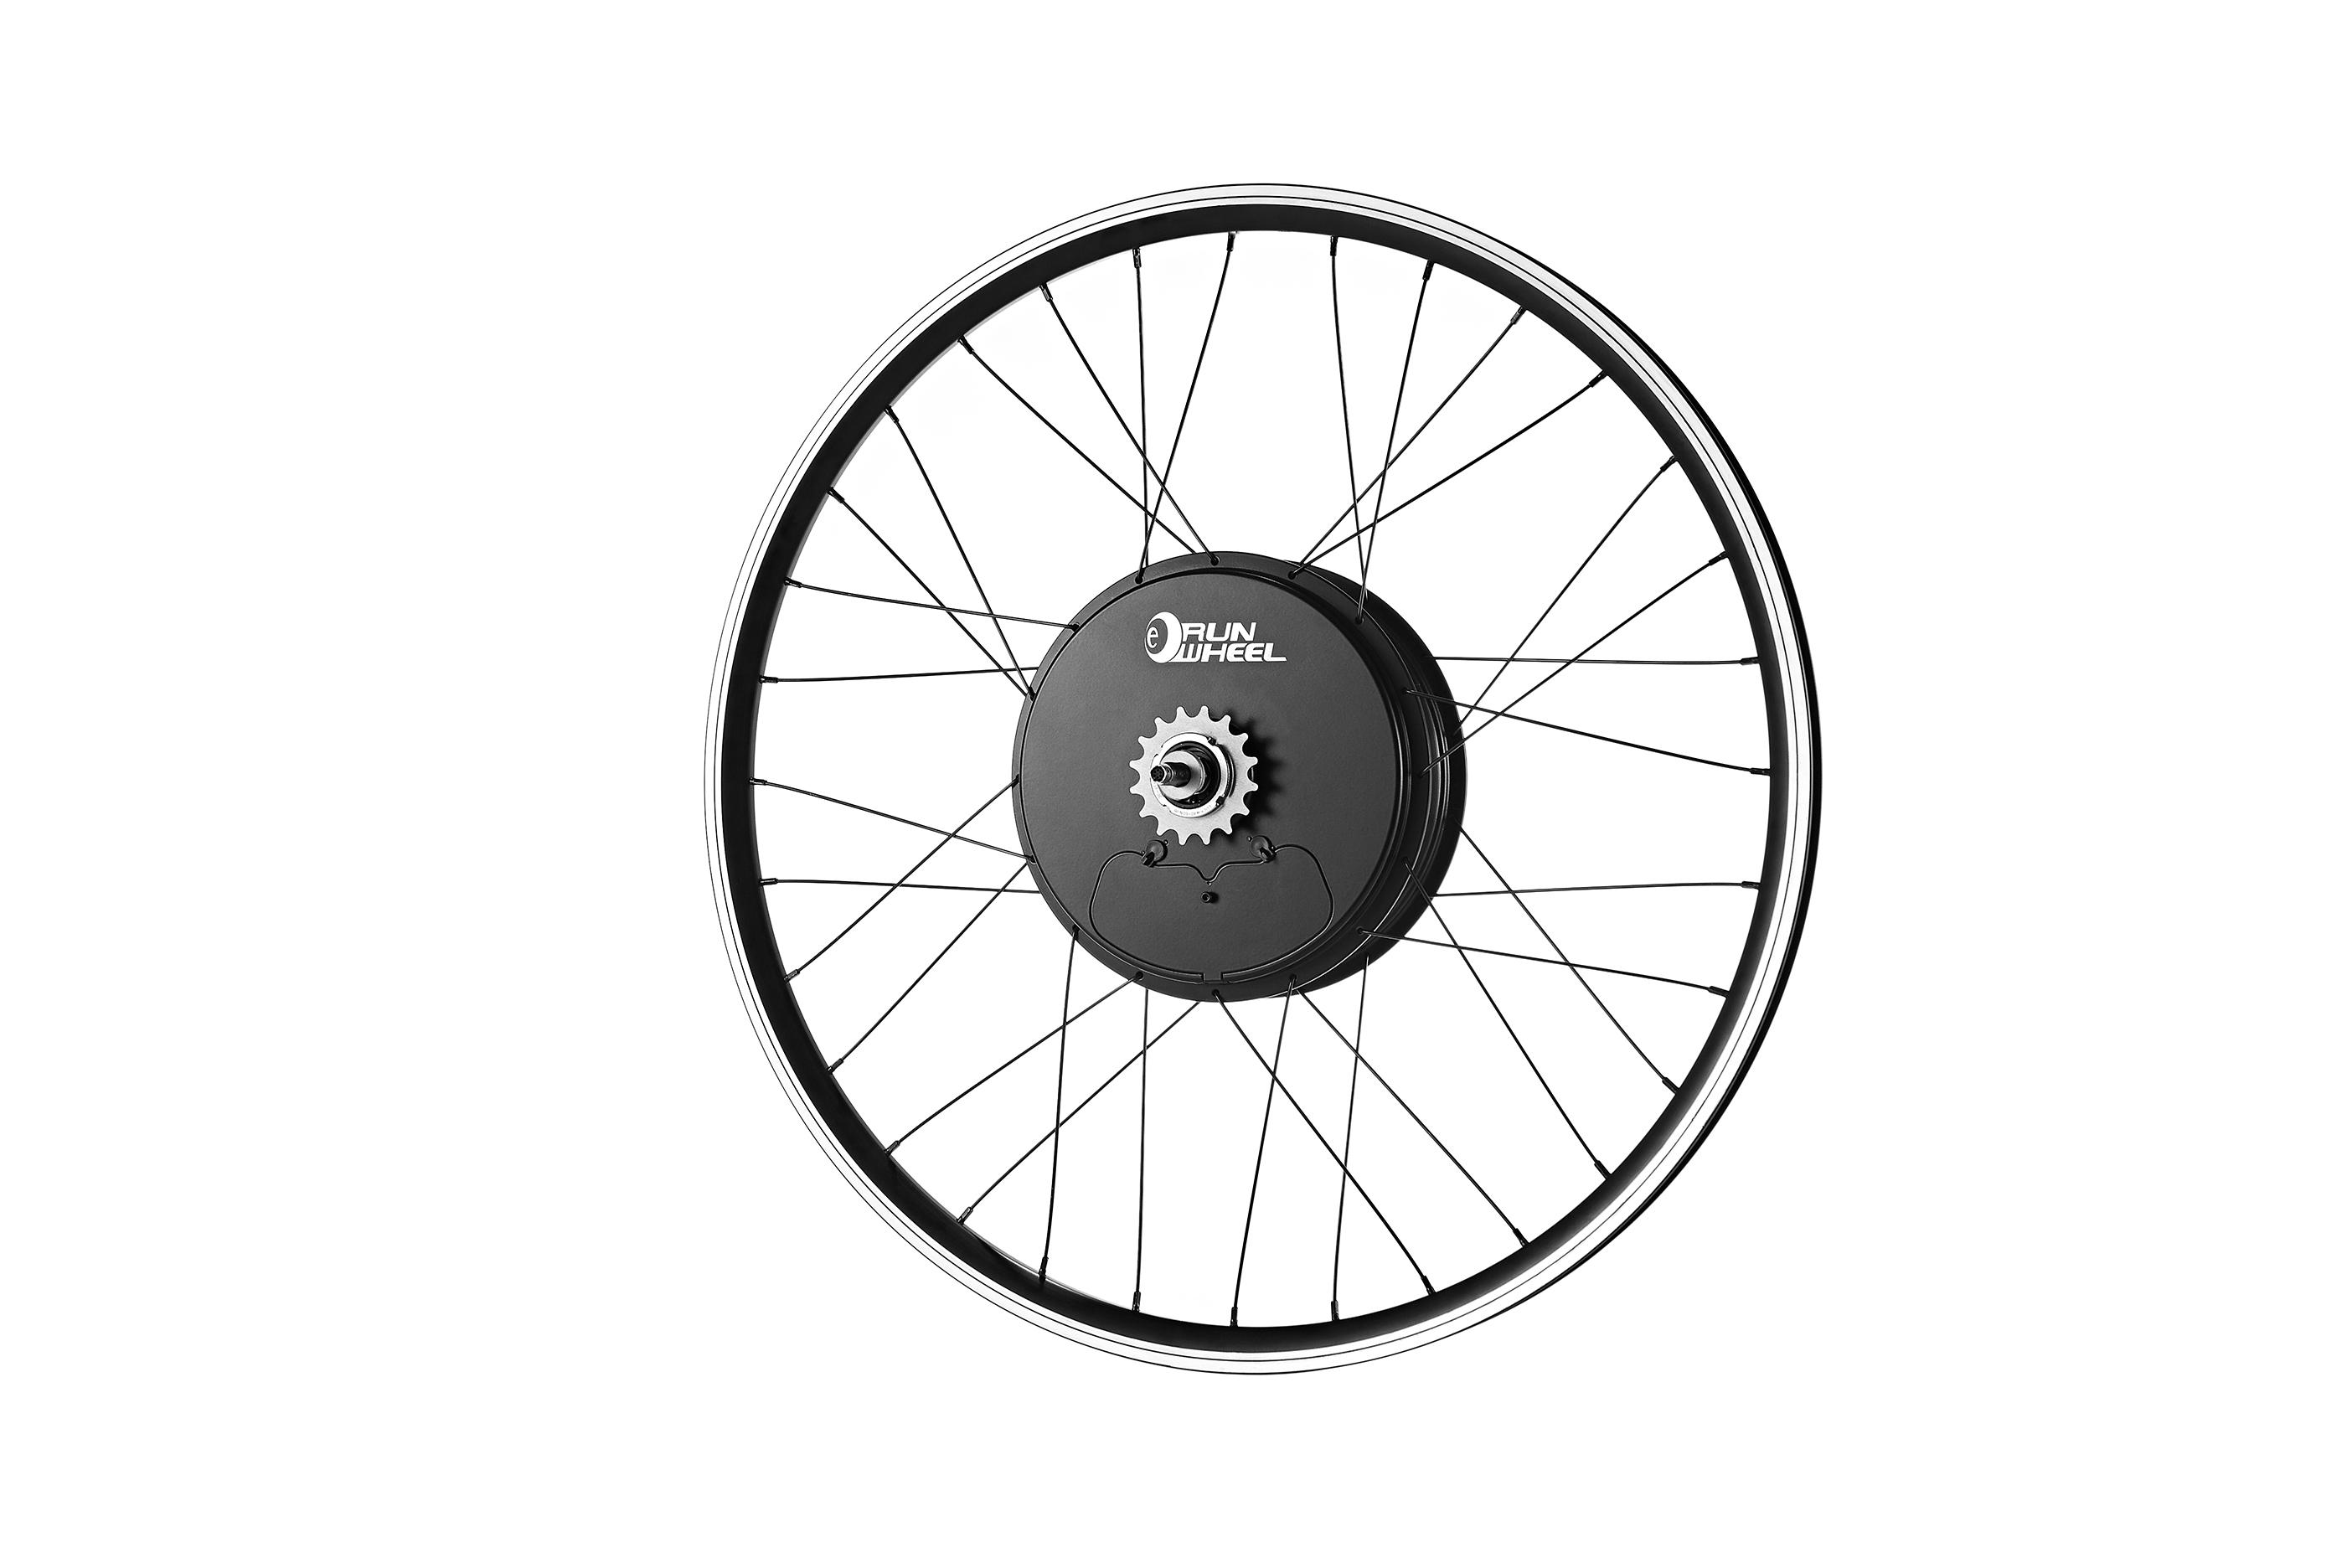 ebike hub motor, electric bike wireless all in one rear hub motor wheel